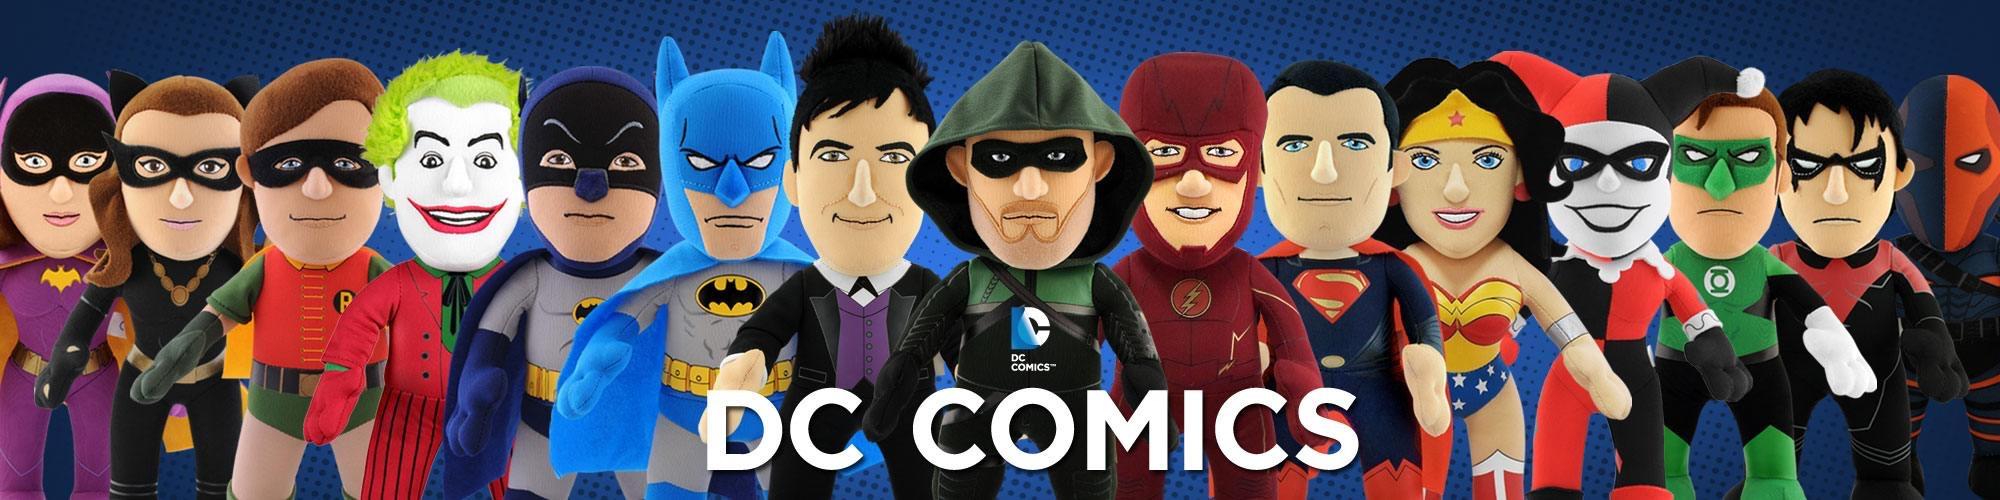 DC_Comics_Updated_Banner